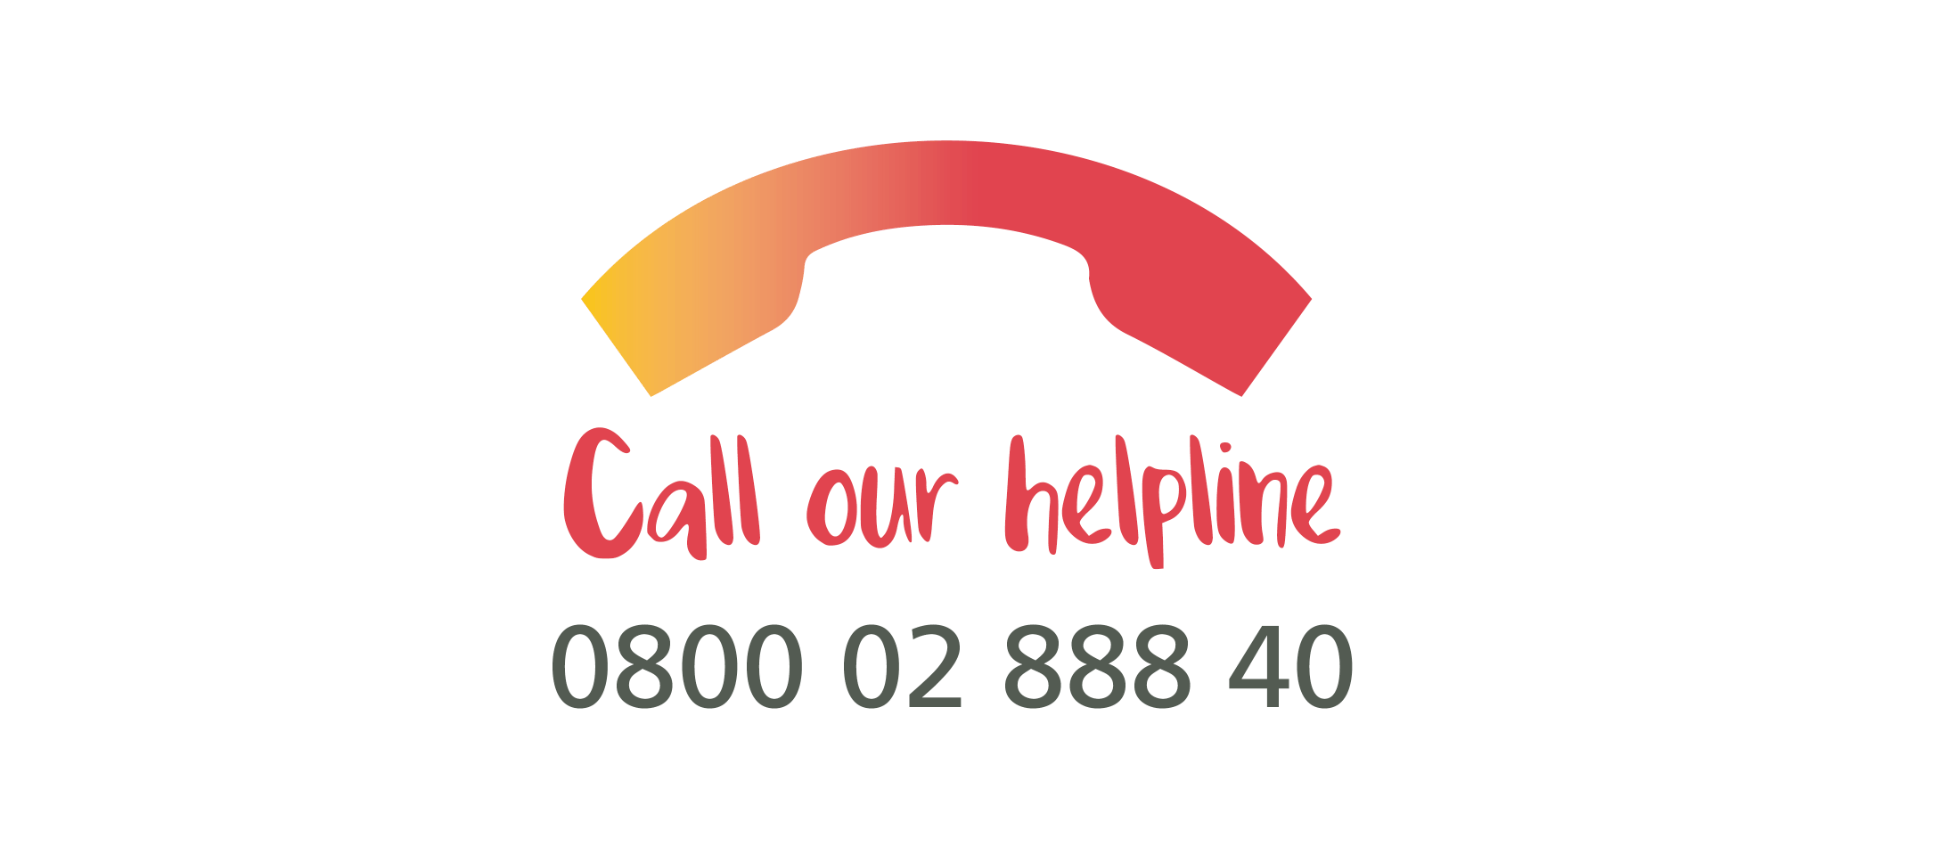 Laat weten hoe jij kan helpen!